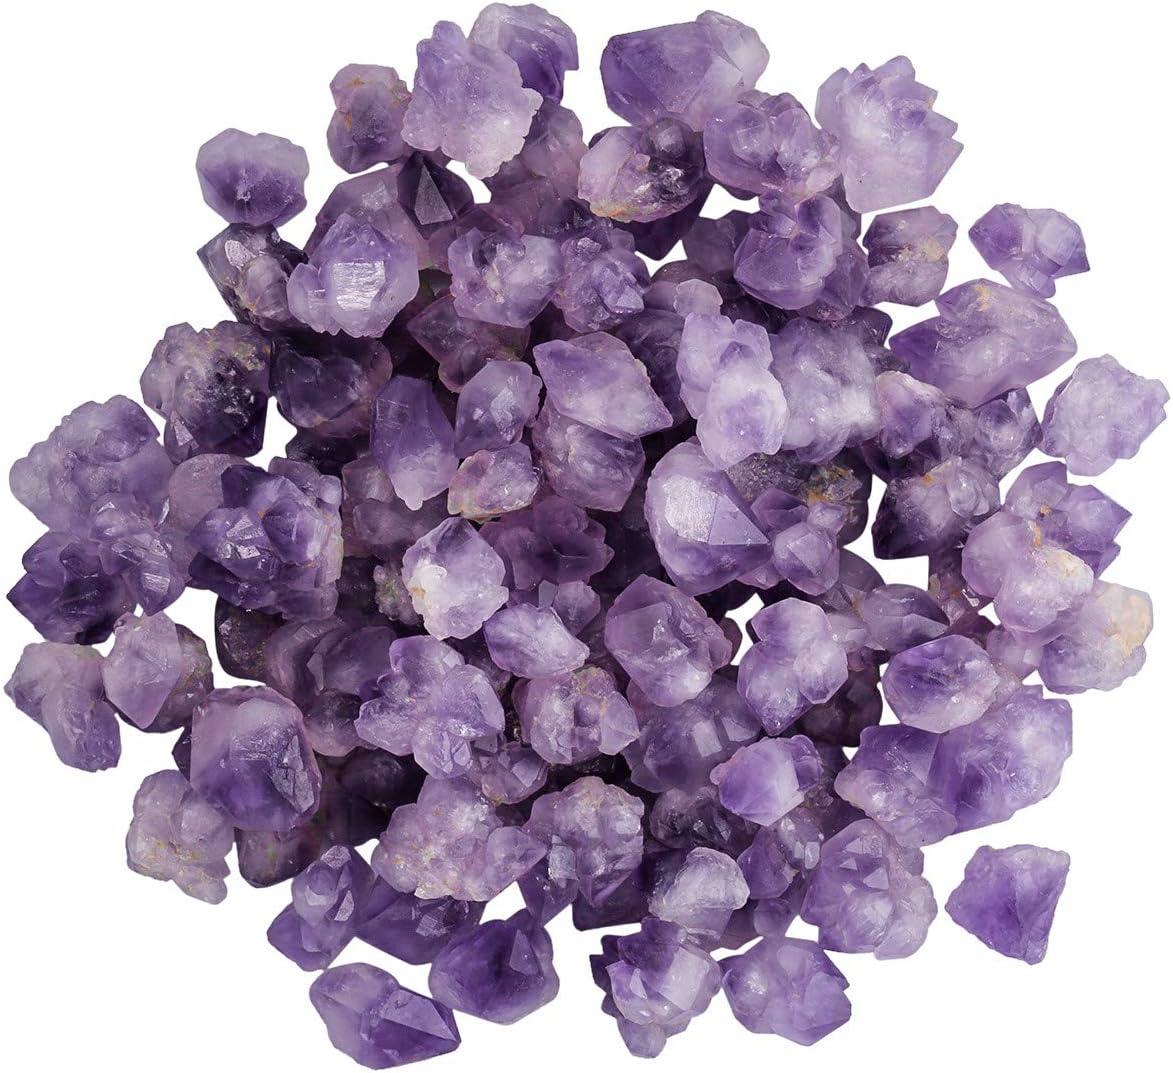 "SUNYIK Natural Amethyst Rough Stone, Irregular Raw Crystal Point Loose Gemstone for Healing Reiki Jewelry Making Decoration 0.7""-1.5"" 0.5lb (33-40 pcs)"